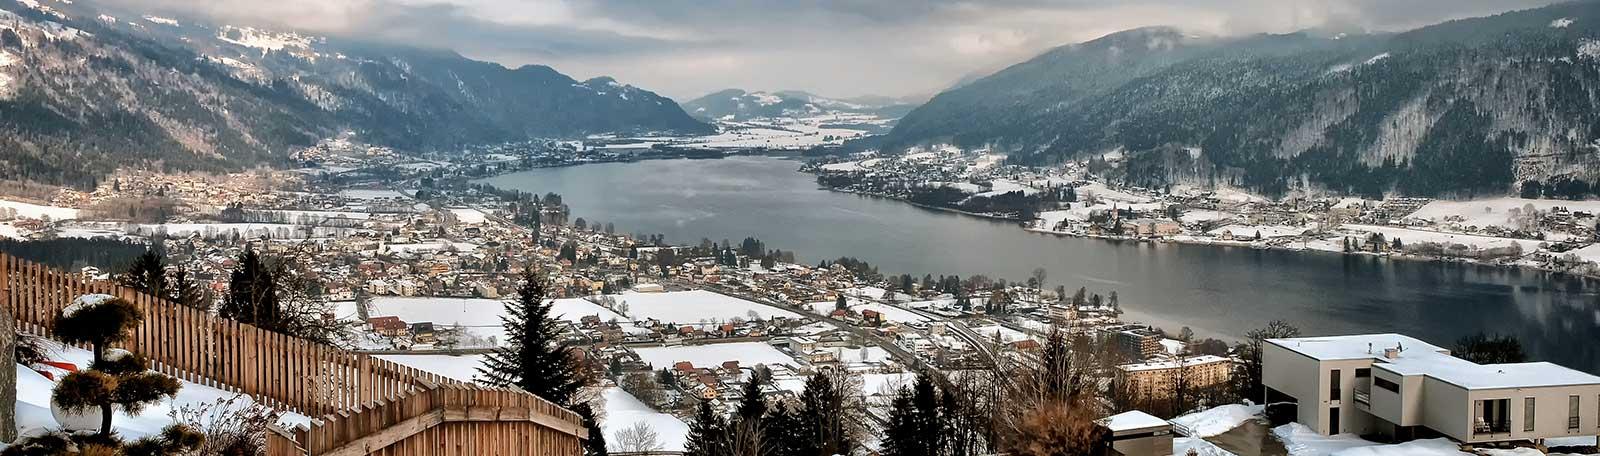 Gerlitzen School Ski Trips